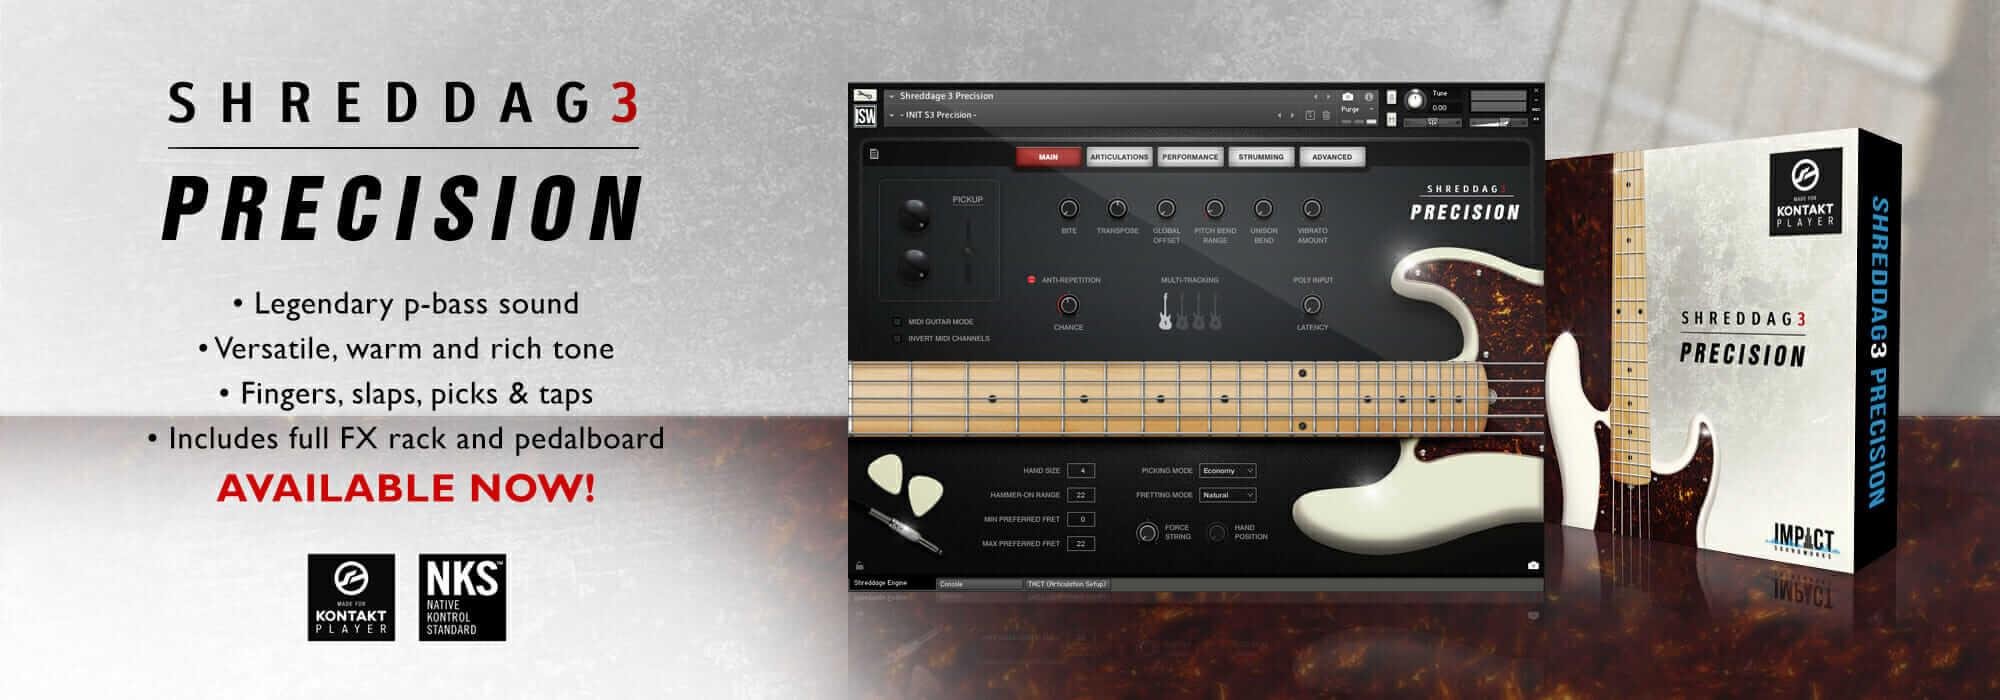 Shreddage 3 Precision - Virtual Bass Now Available